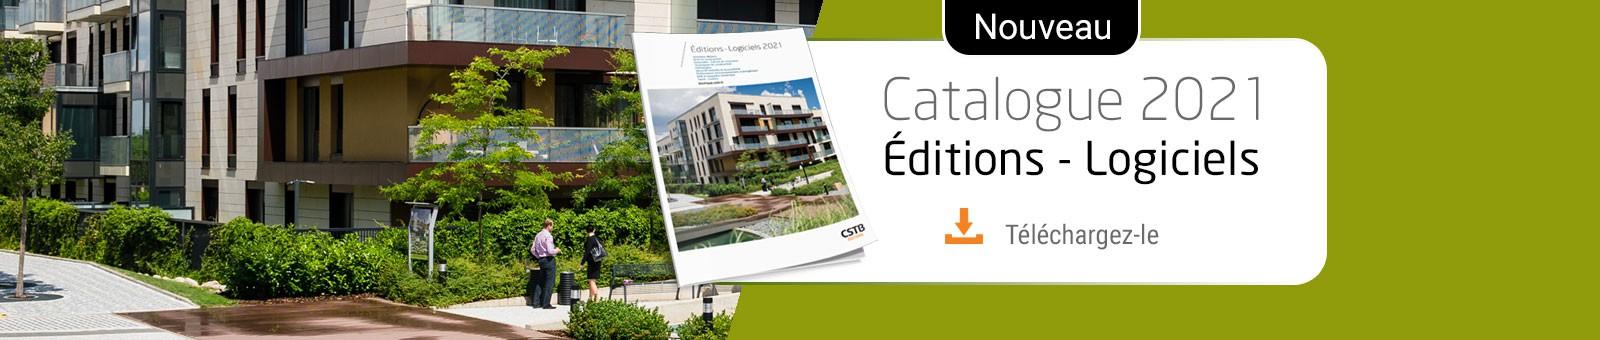 Catalogue web CSTB Editions et Logiciels 2021